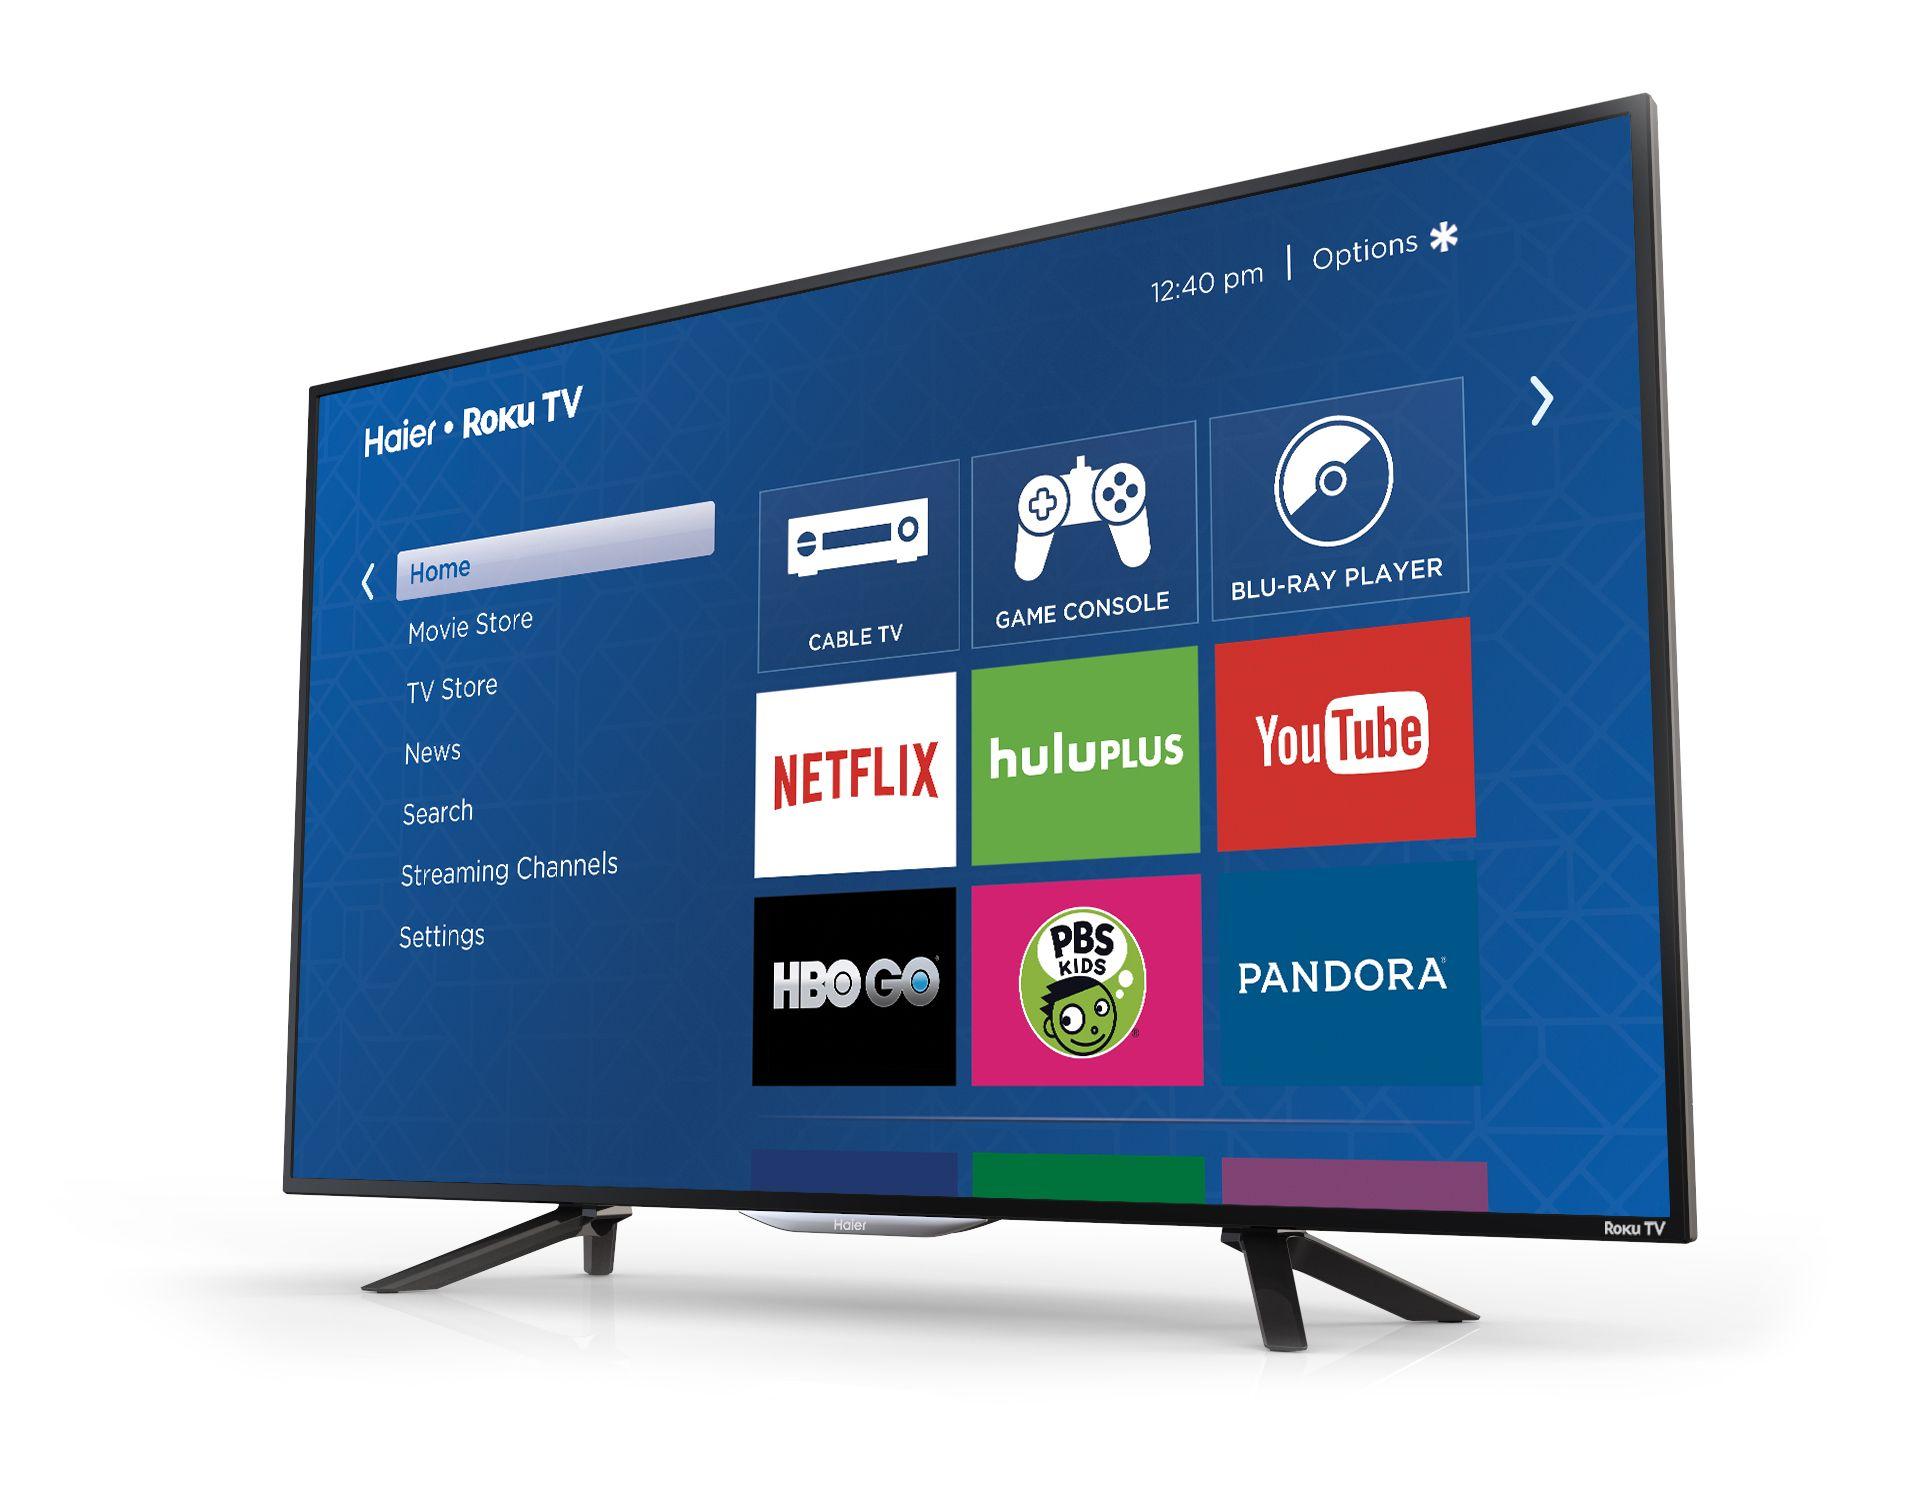 Tcl 65r617 | Roku | Smart tv, Cool tech gadgets, Tv reviews